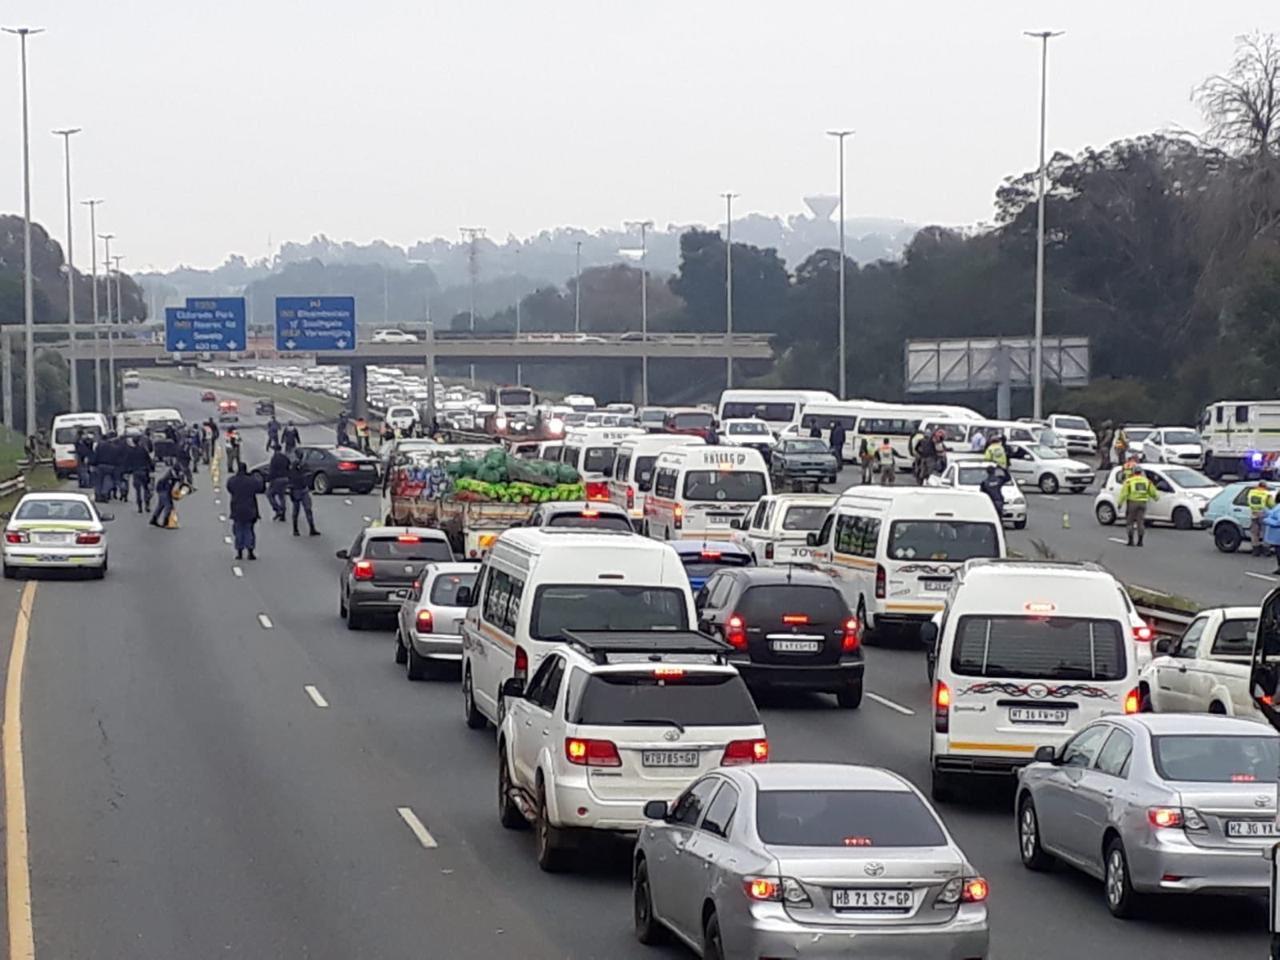 Minister of Transport |Mr Fix on Twitter